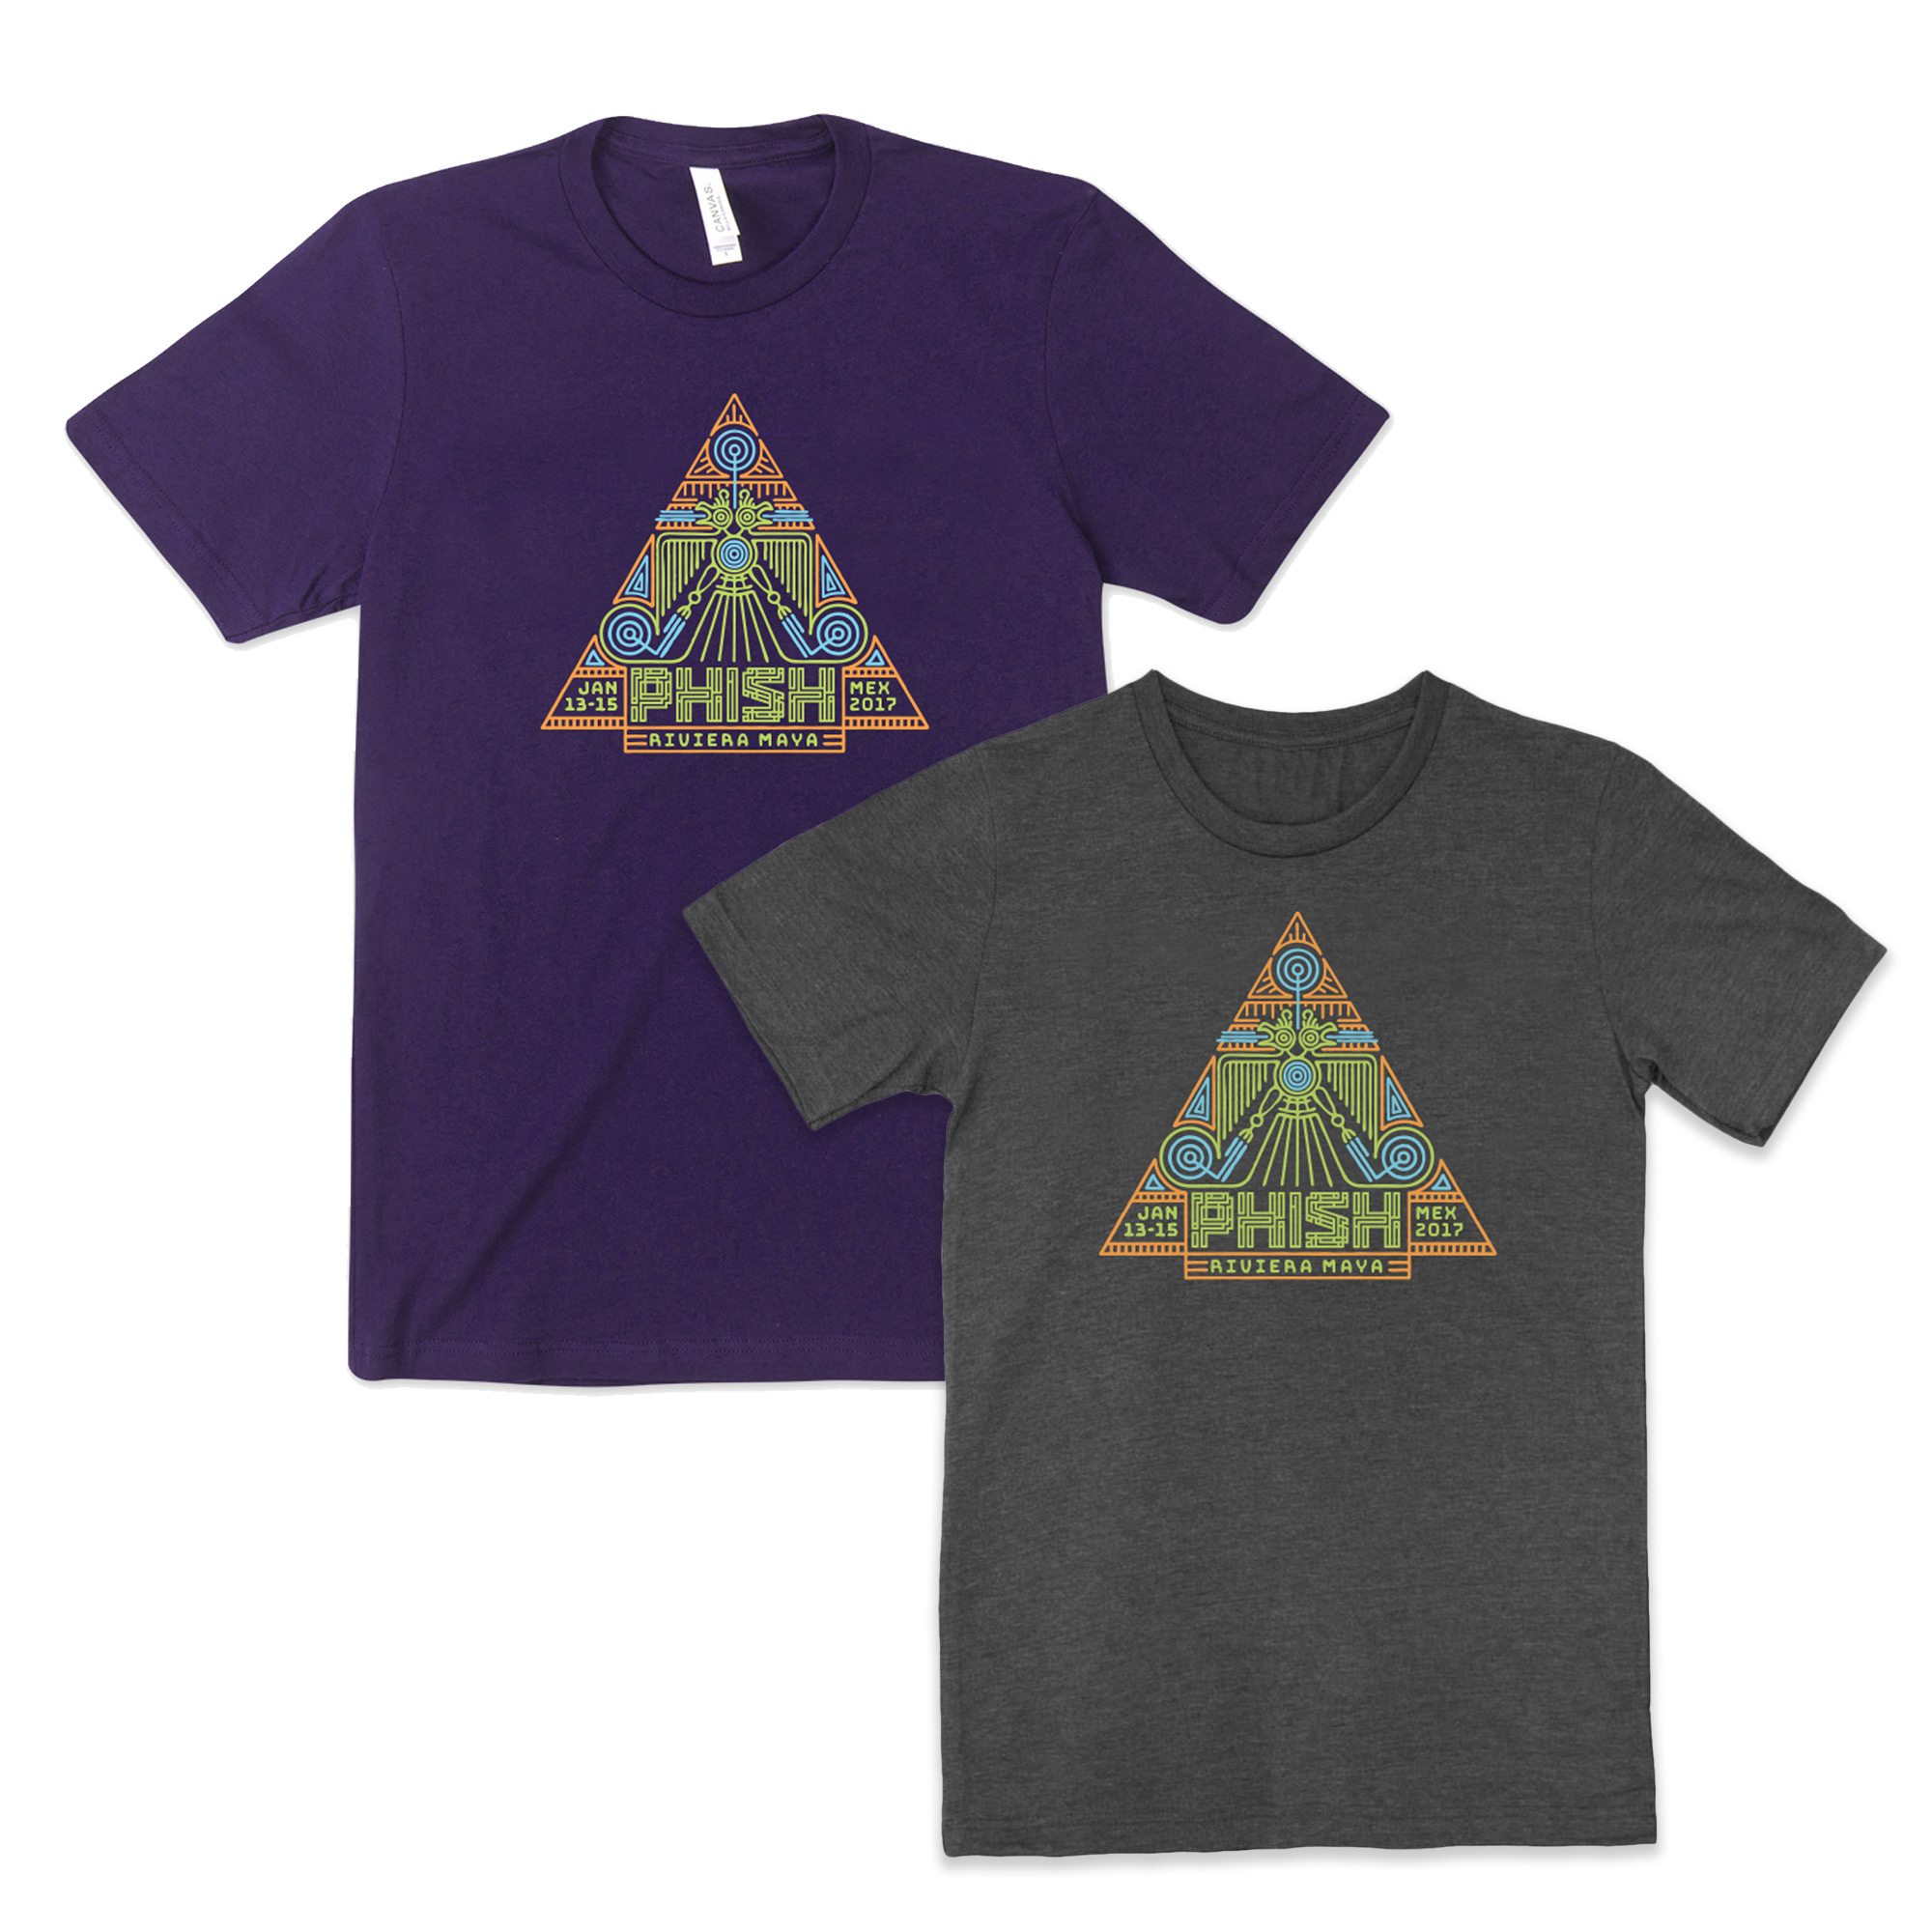 Mexico 2017 Pyramids Redux Tee